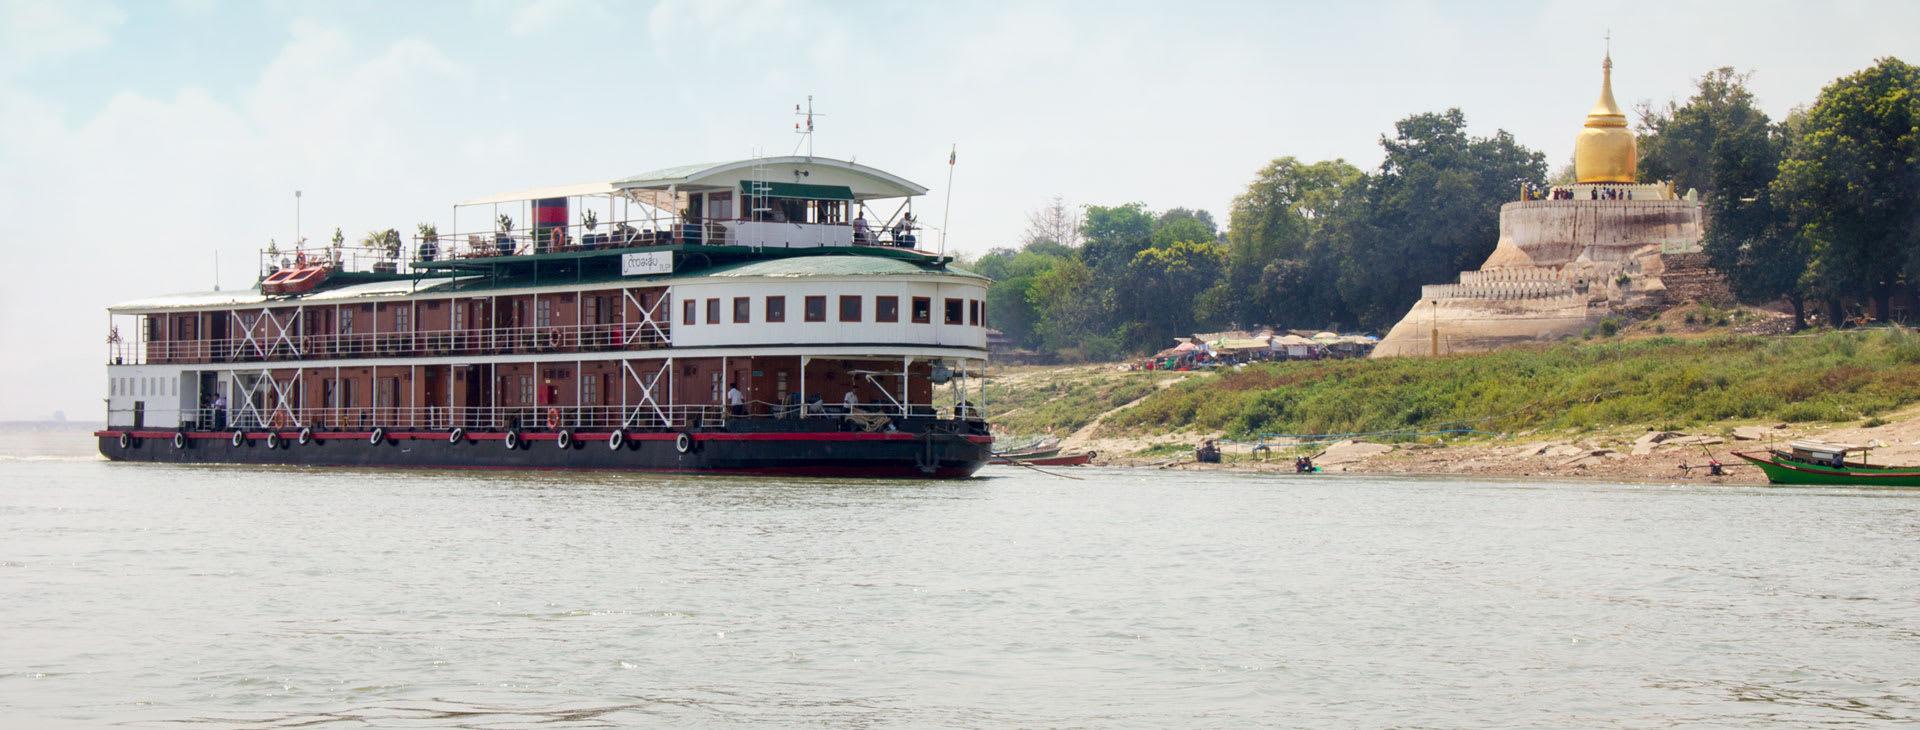 Pandaw II on the river